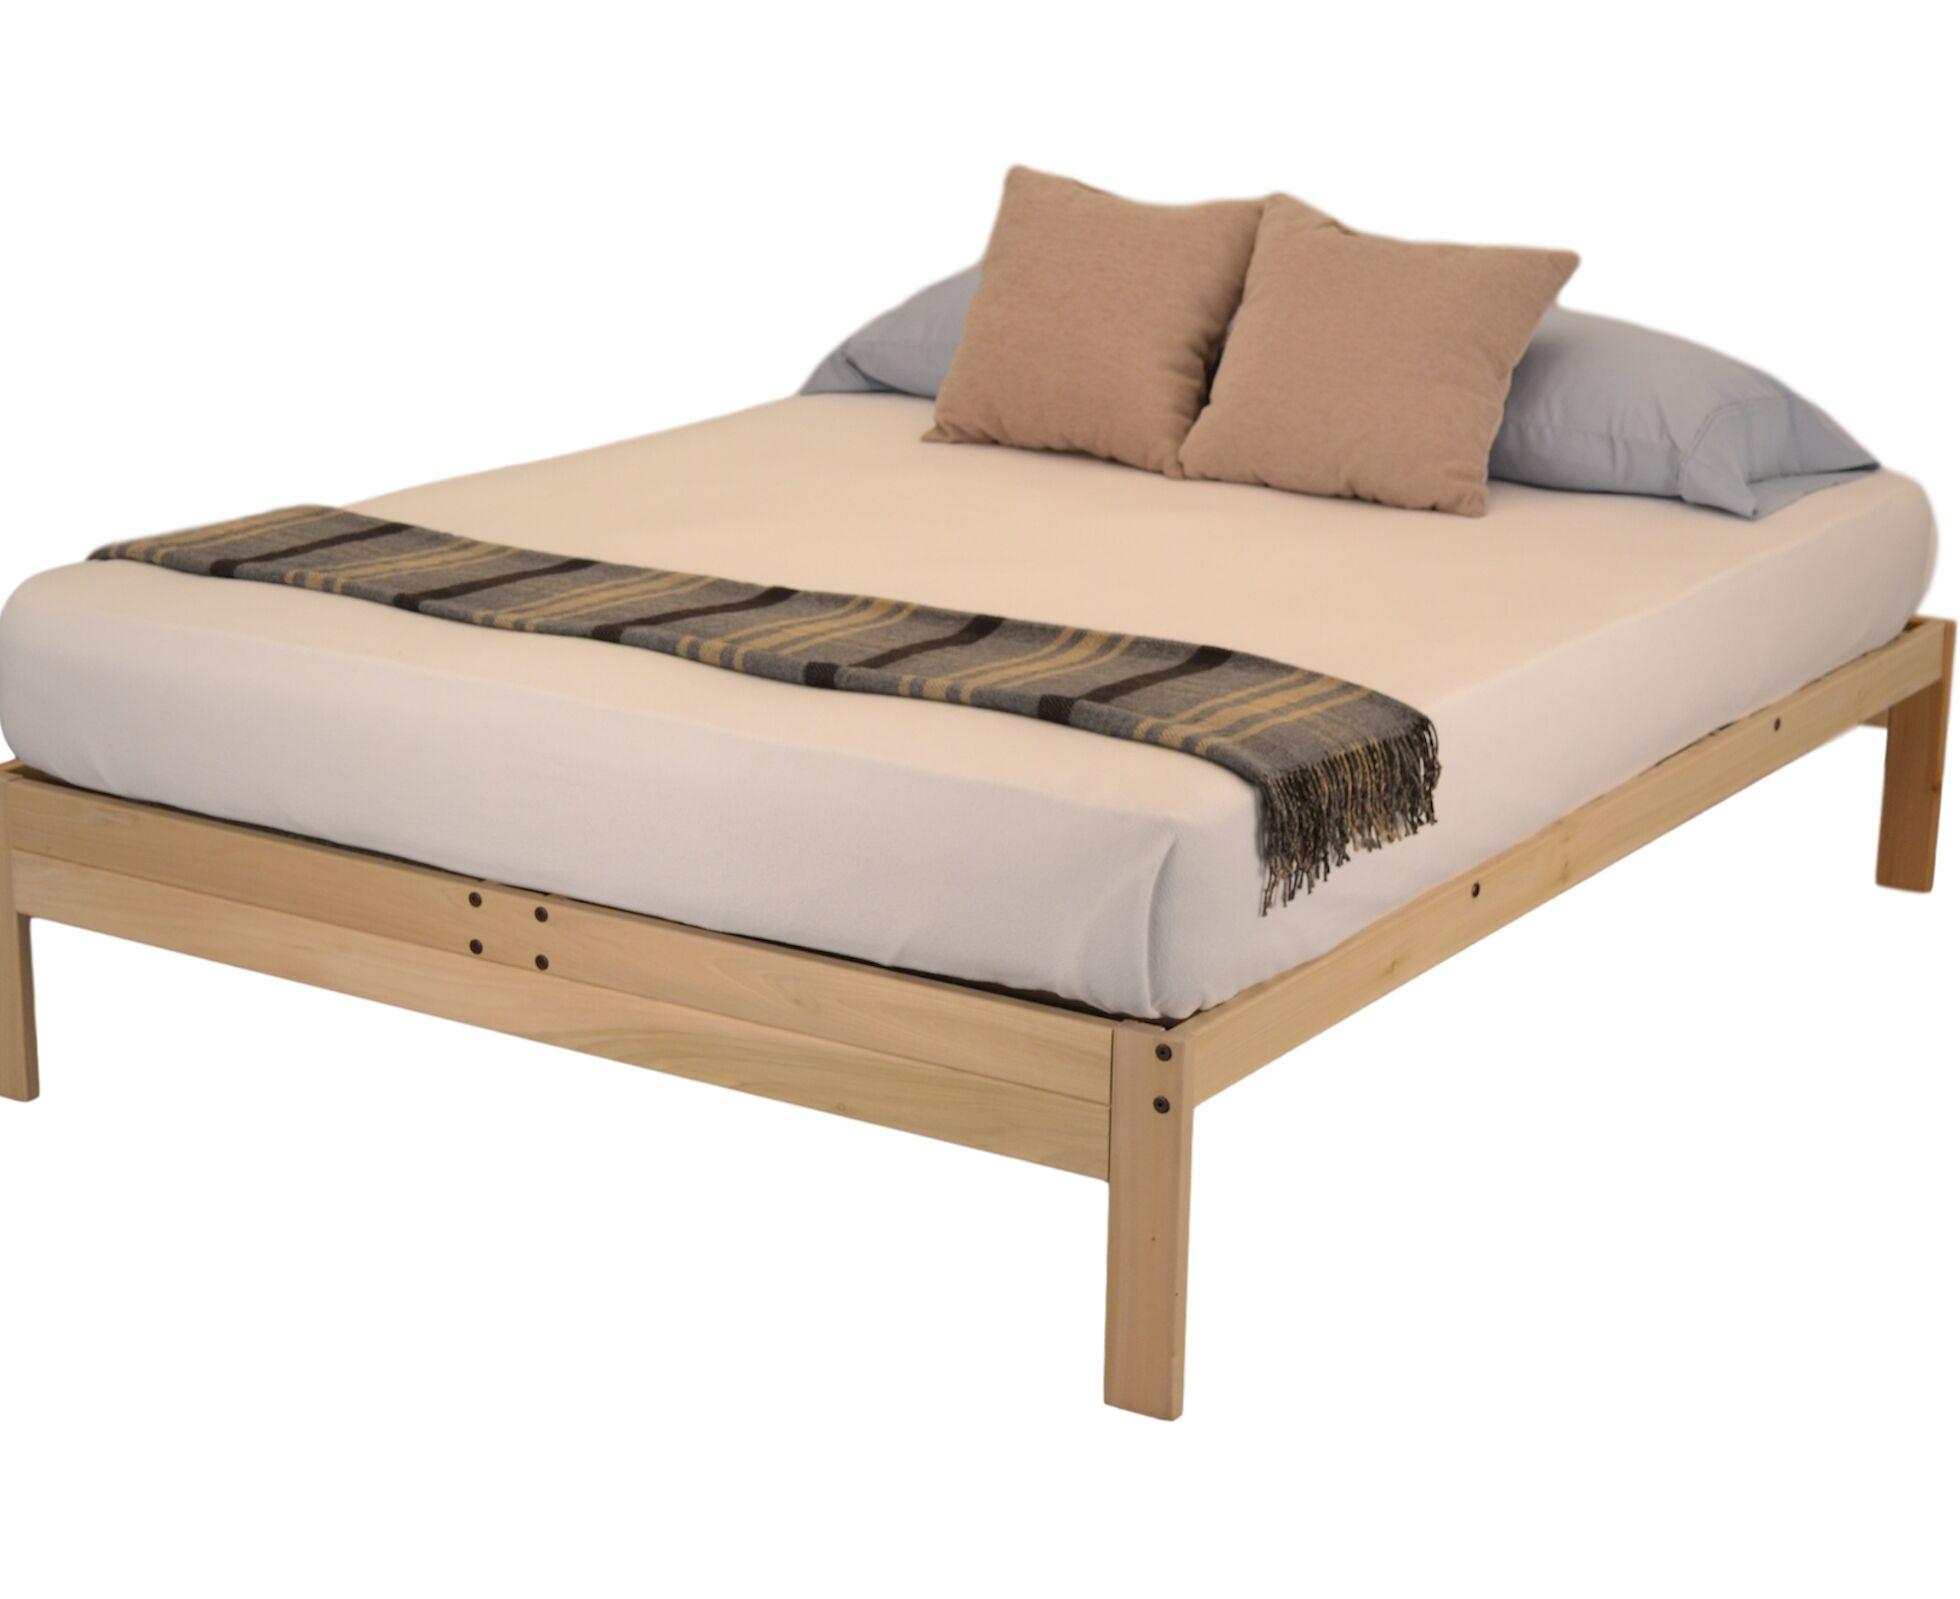 Nomad 2 Platform Bed Size: Twin